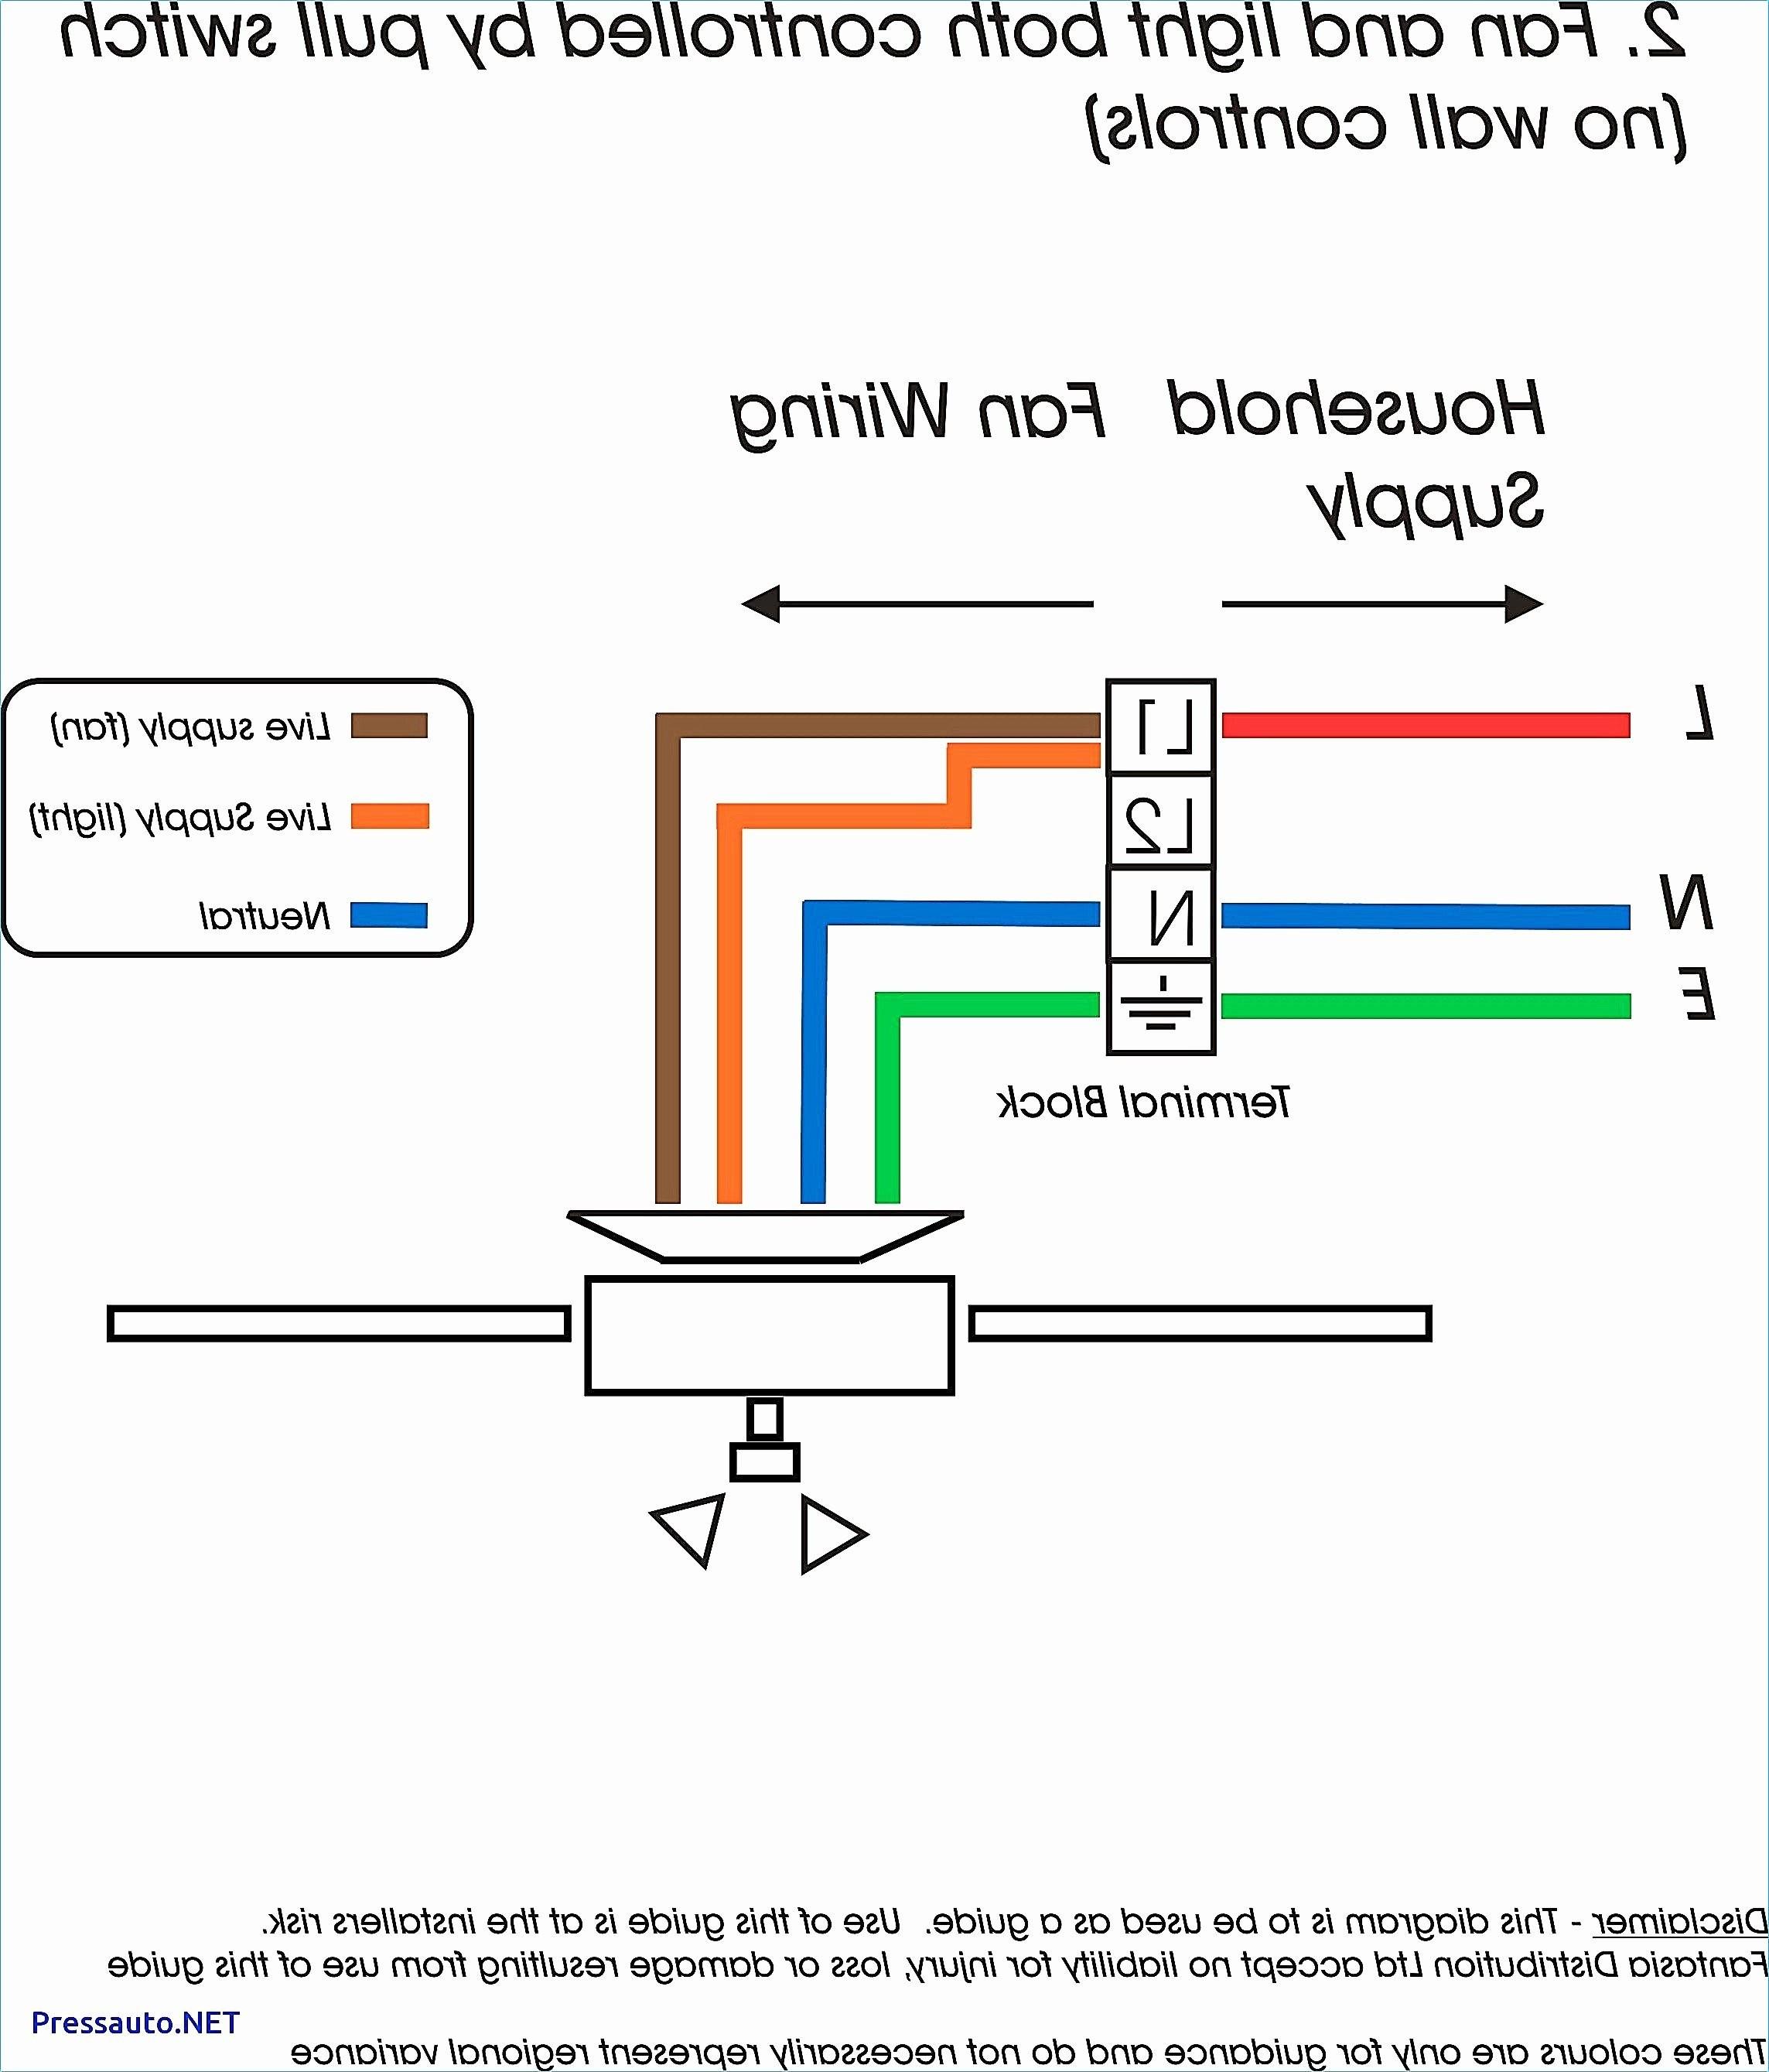 zimmatic wiring diagram example electrical circuit u2022 rh labs labs4 fun trailmobile trailer wiring diagram trailmobile trailer wiring diagram